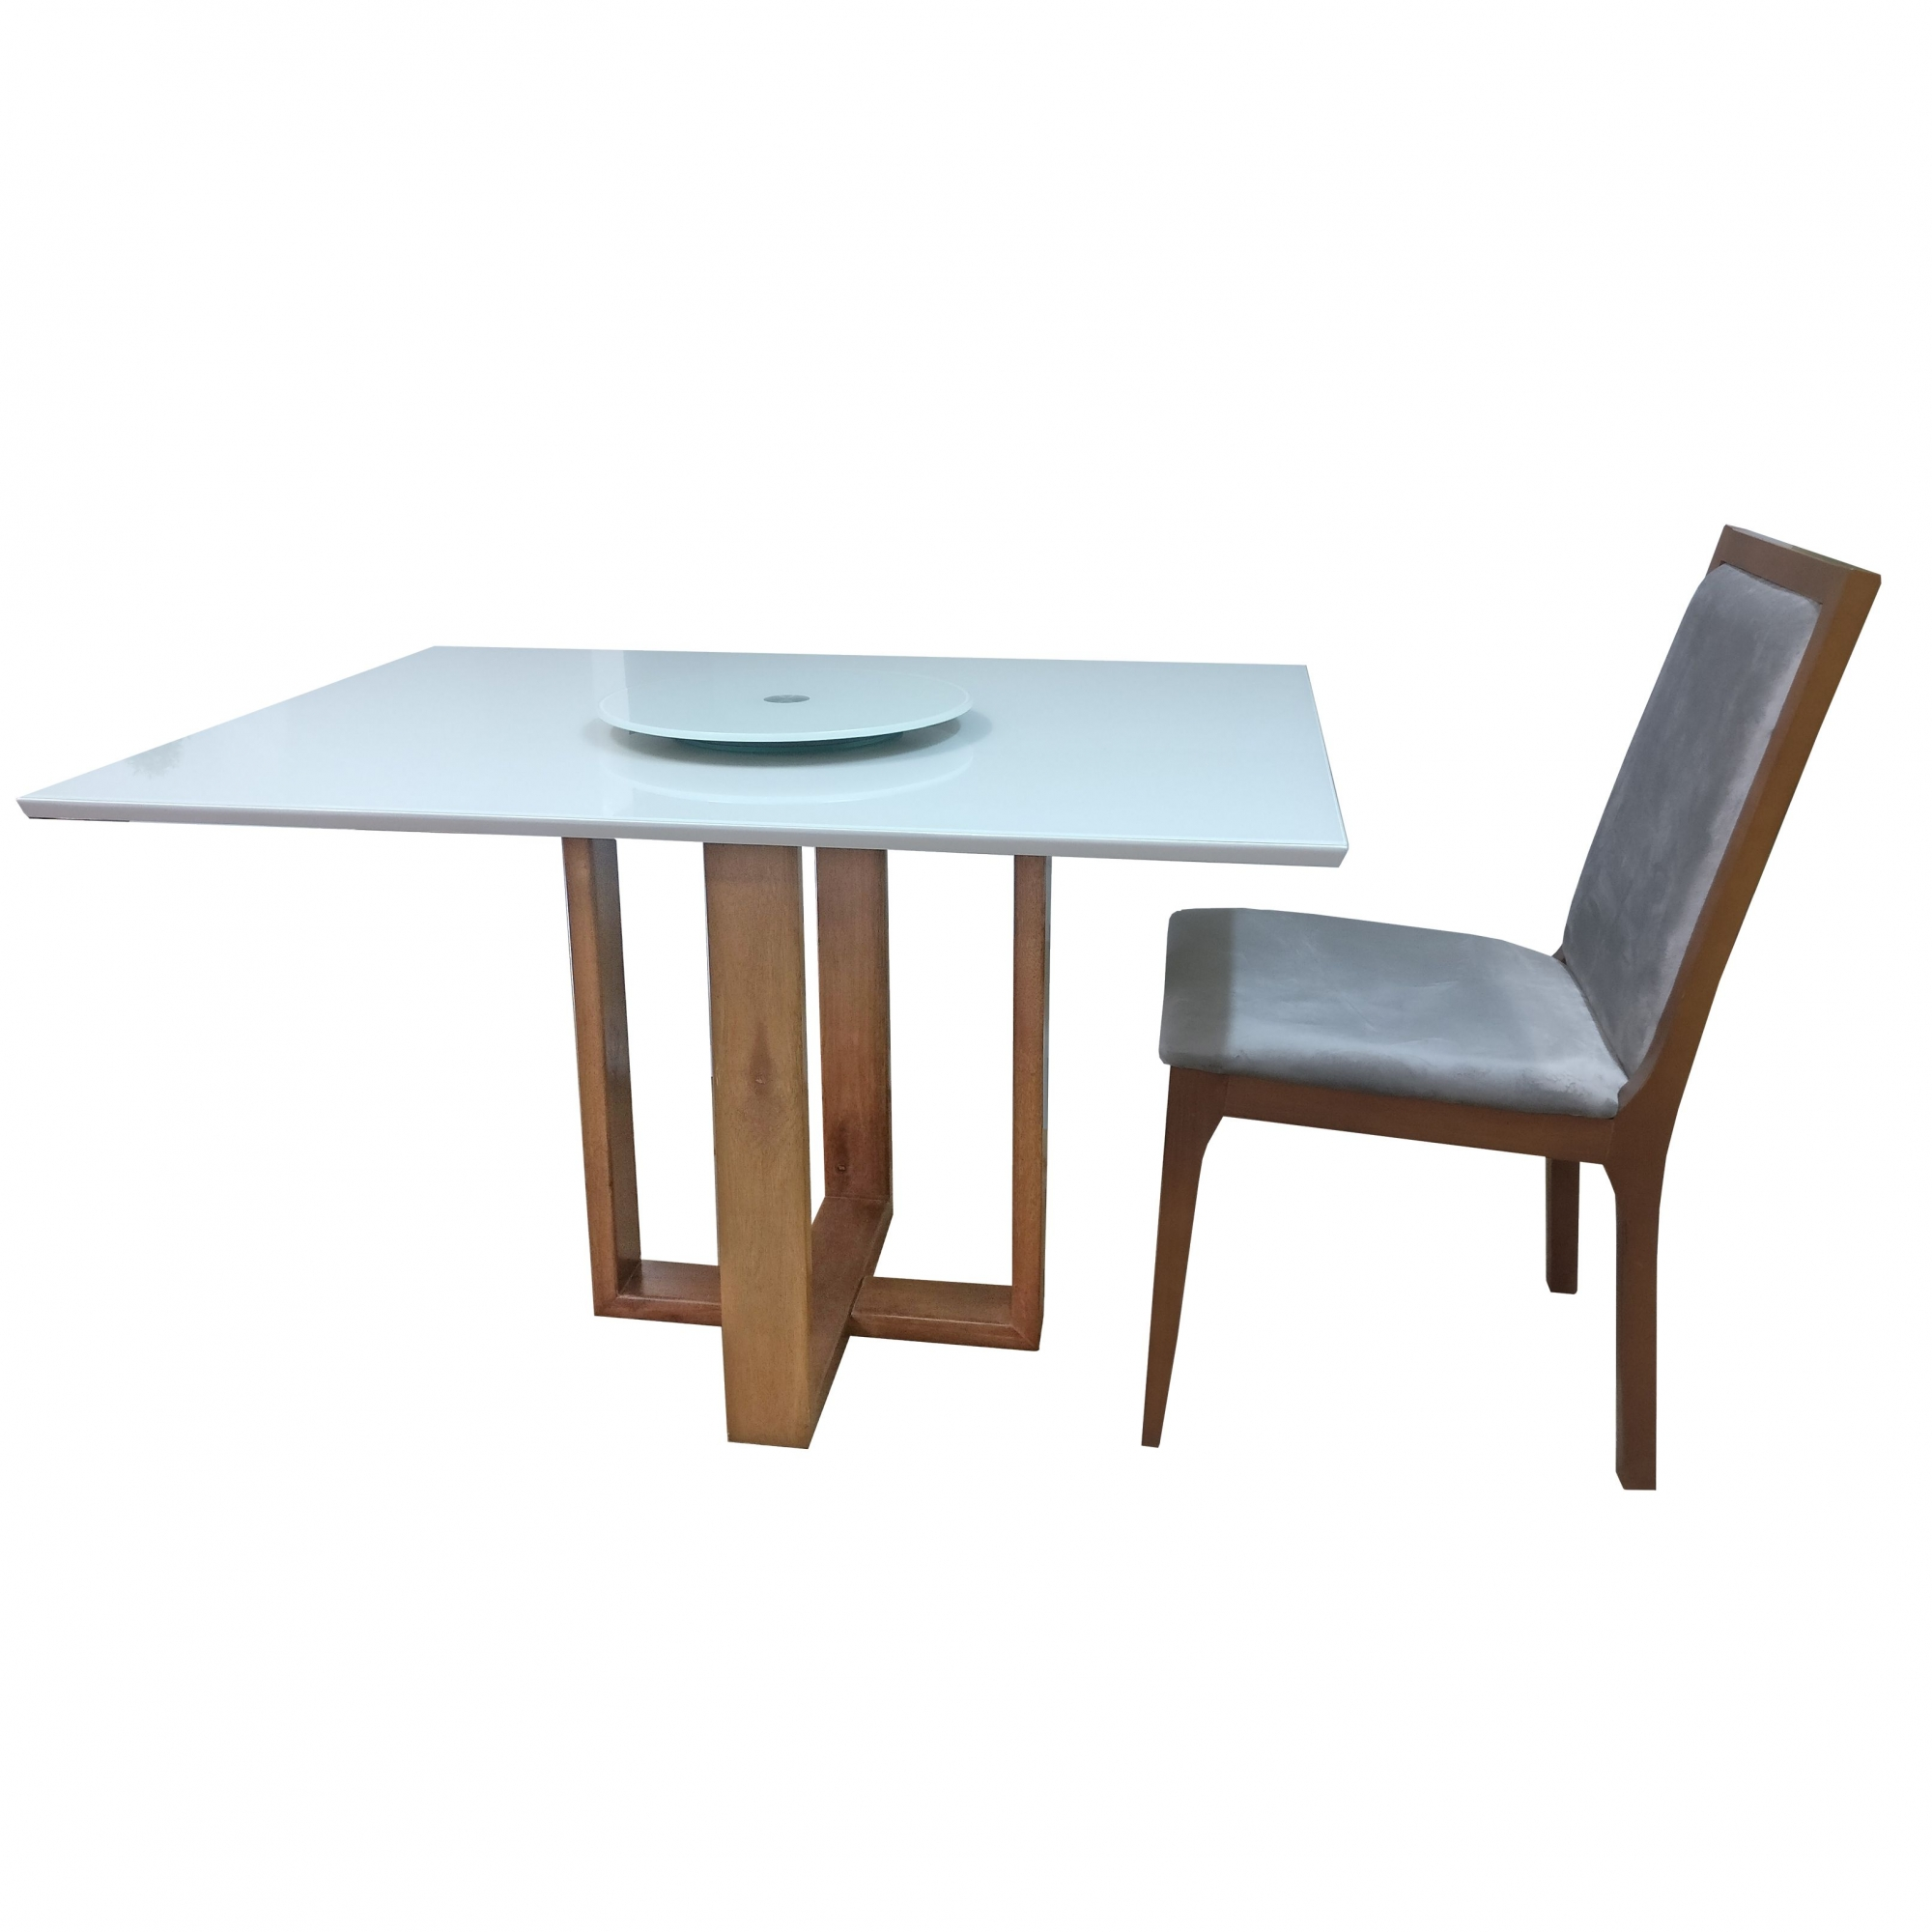 Base para Mesa Sala de Jantar em Madeira Ametista 55x55cm